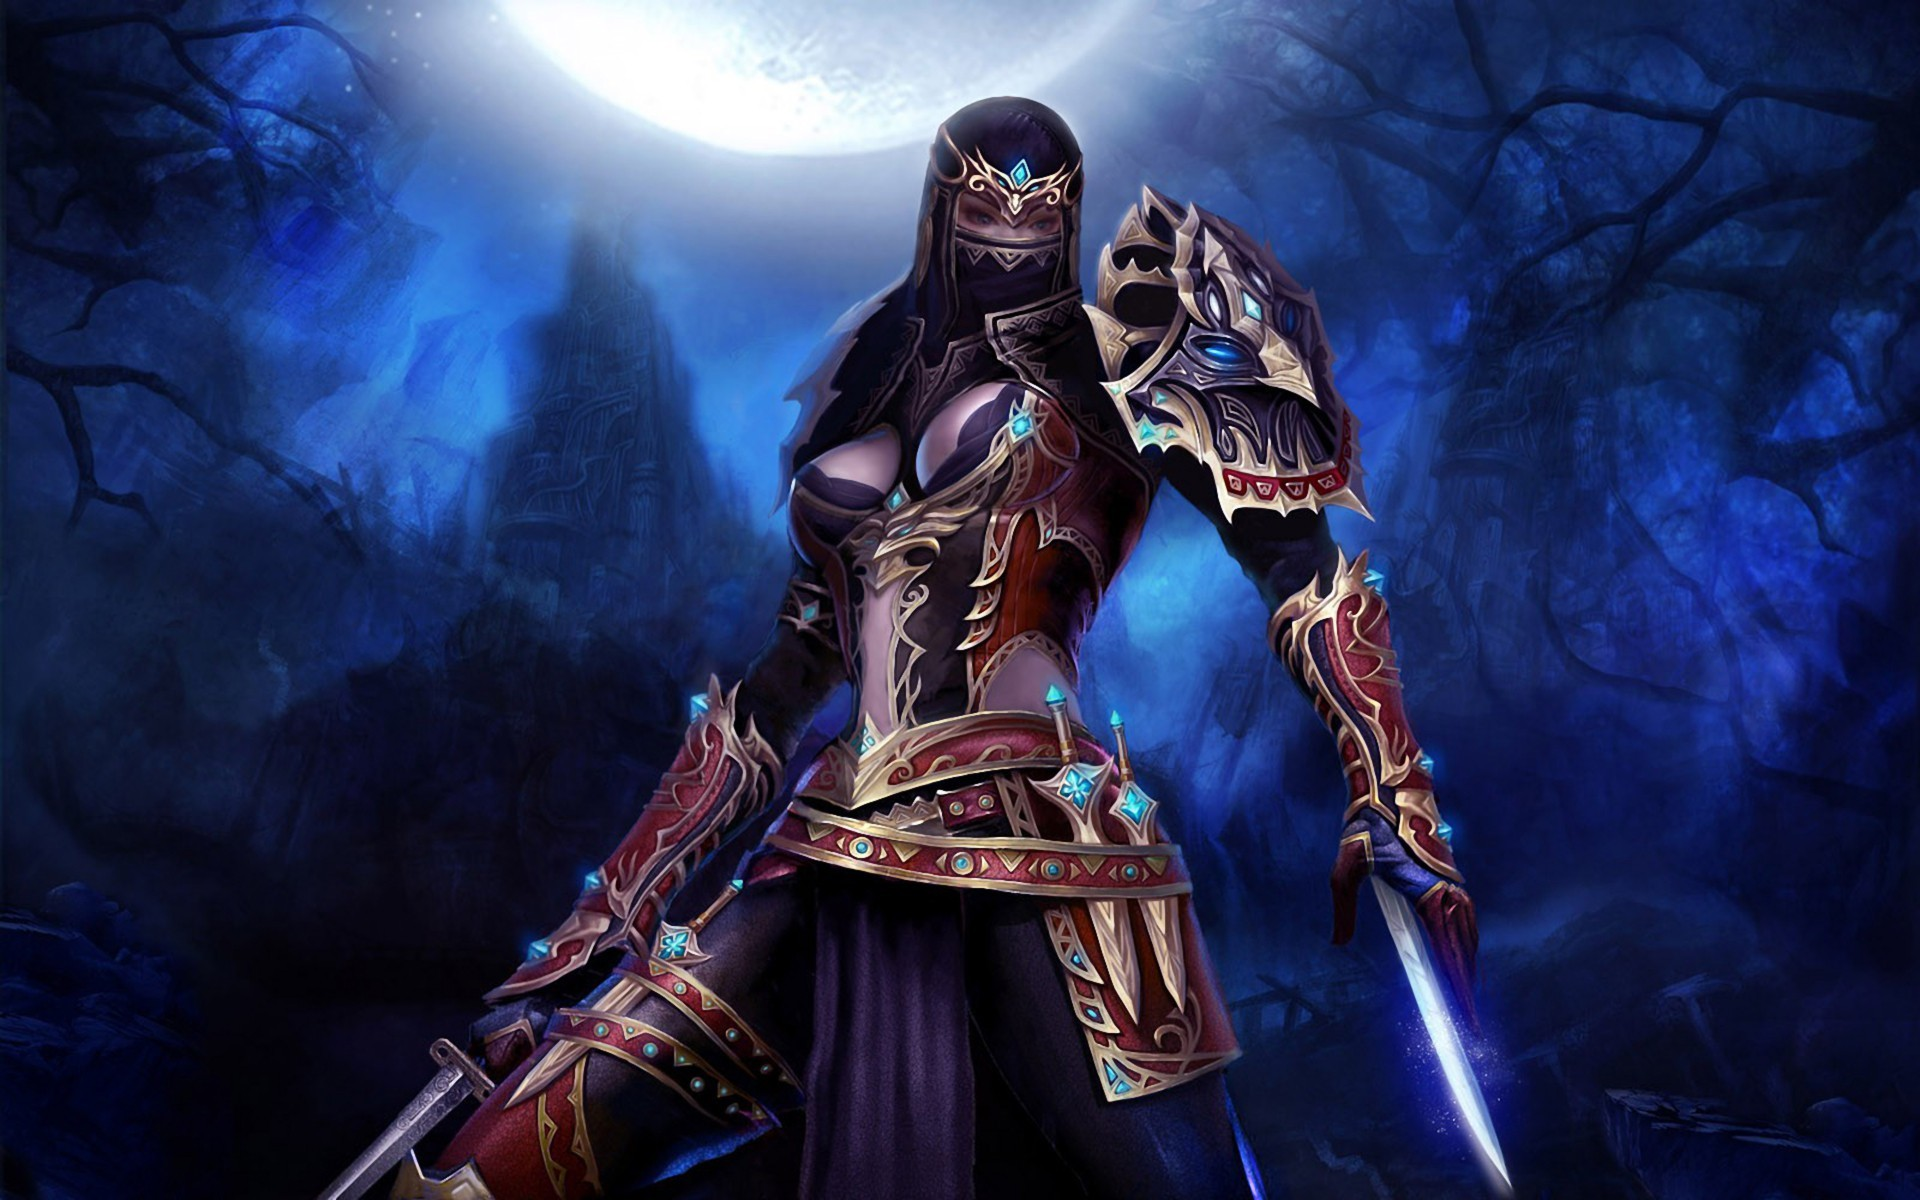 Women Warrior Artwork Sword Rain Cyberpunk Cyberpunk: Rain Ninja Assassin Wallpaper (62+ Images